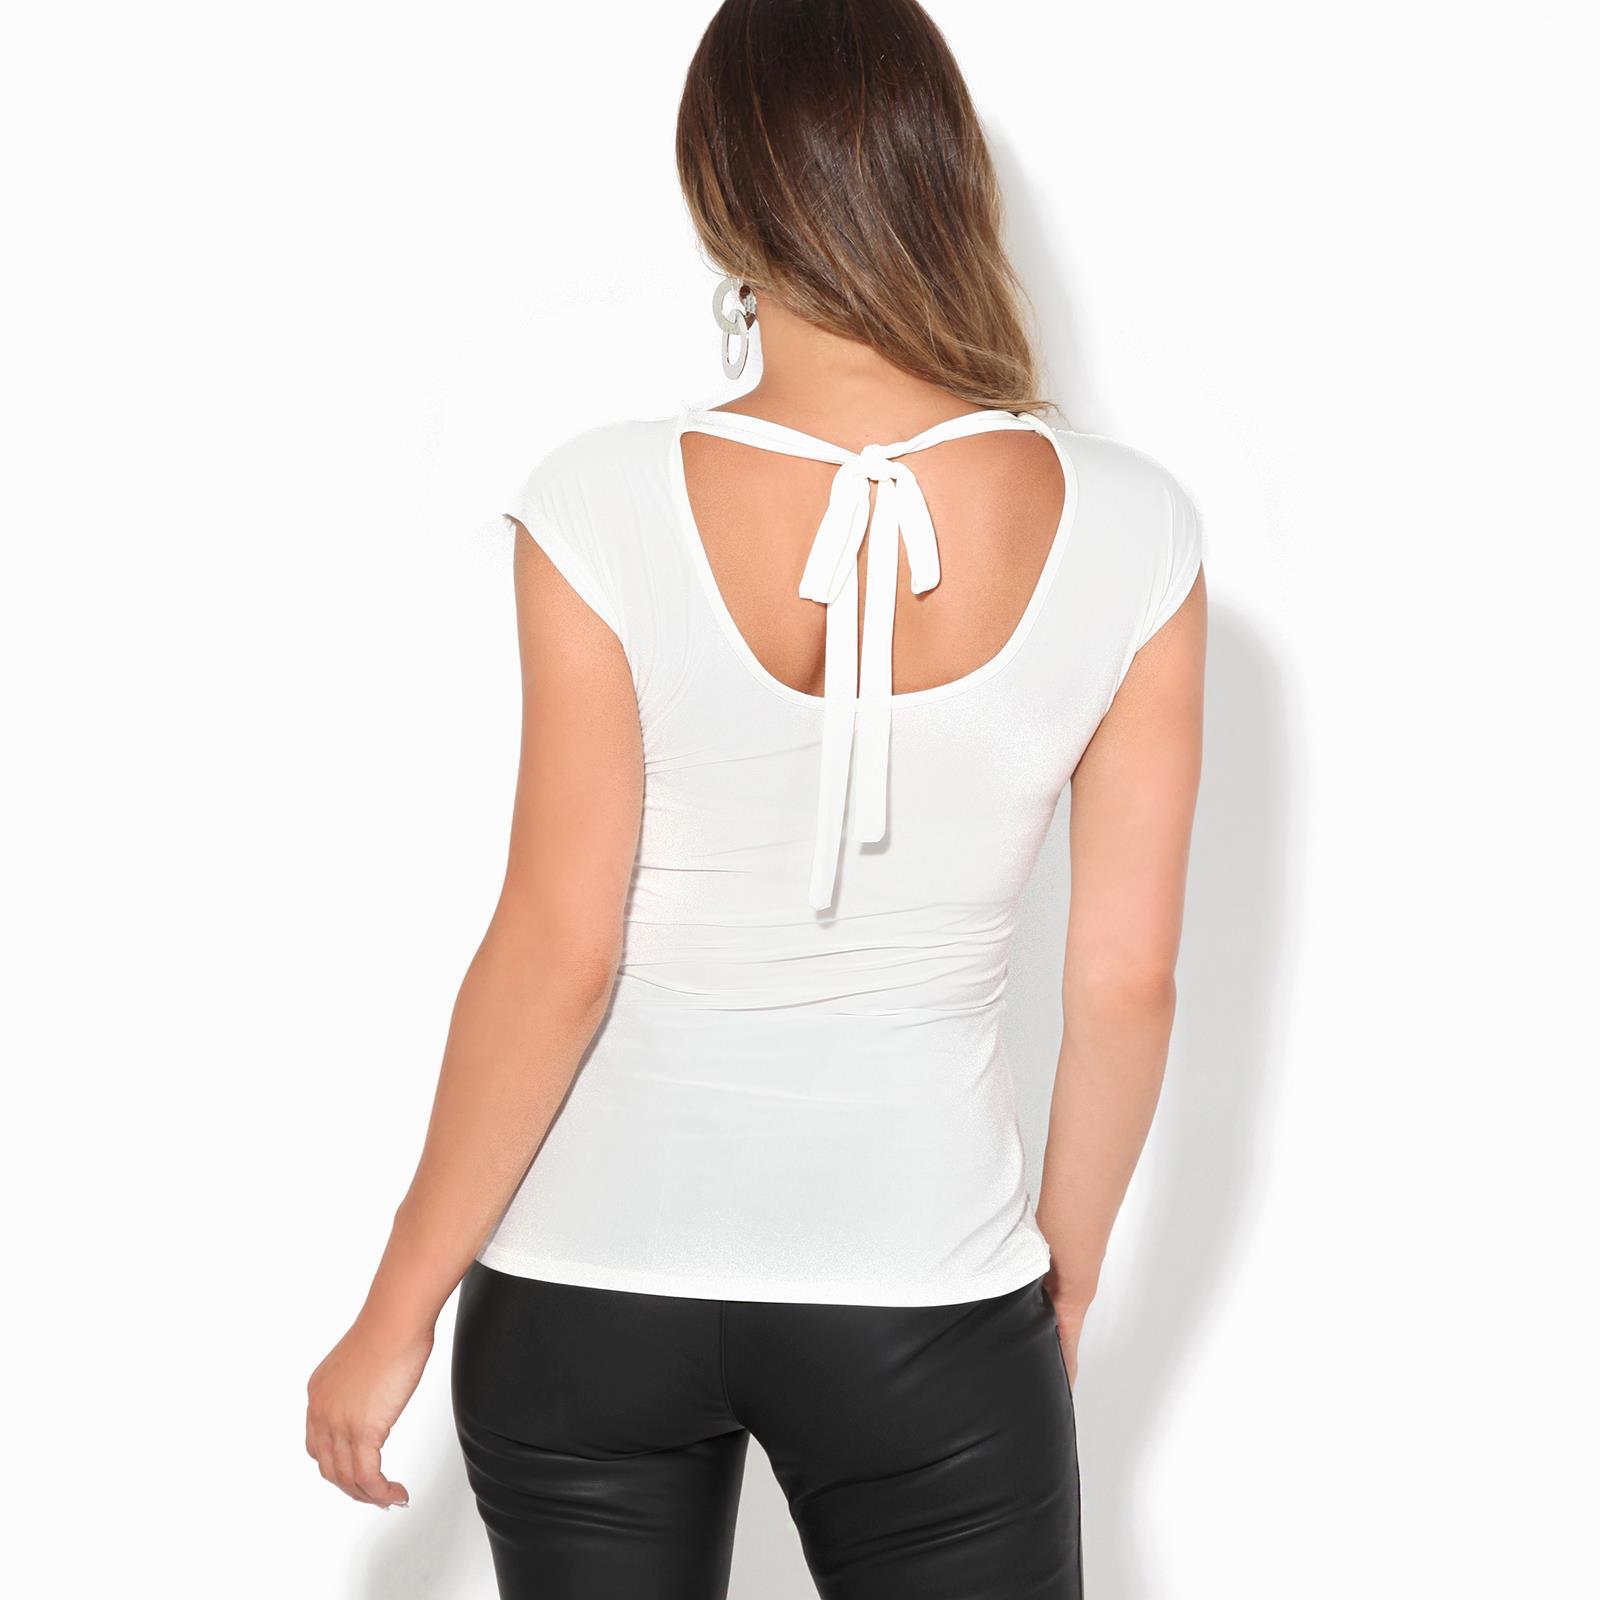 Femme-Top-Haut-Soiree-Decollete-N-ud-Dos-Chic-Sexy-Mode-Grande-Taille-Debardeur miniature 9